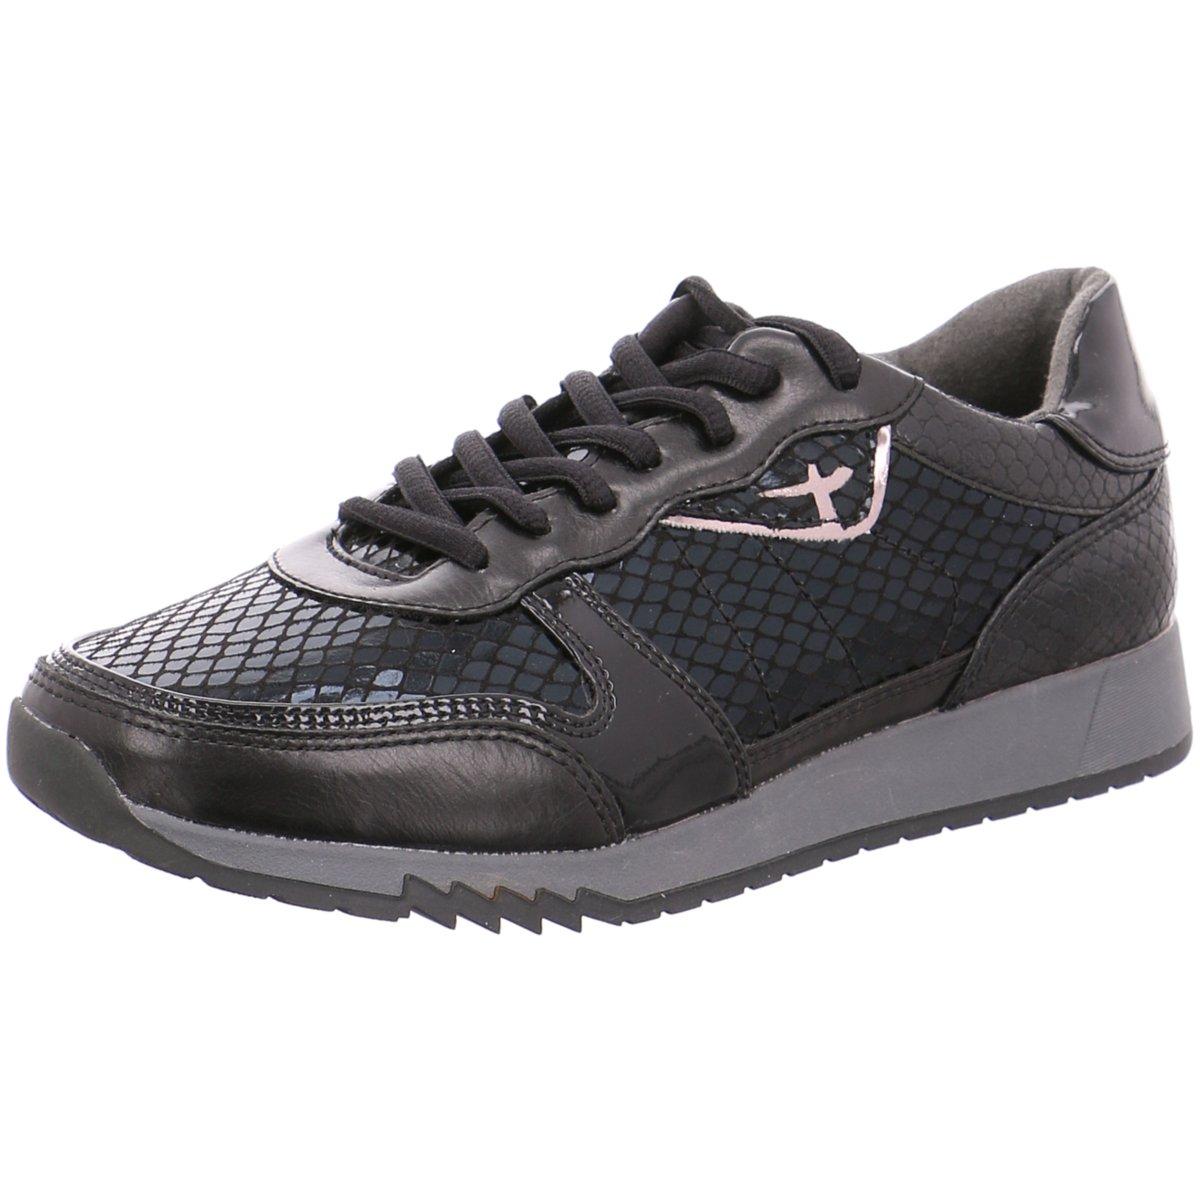 NEU Tamaris Damen Sneaker 1-1-23602-27/069 grau 154107